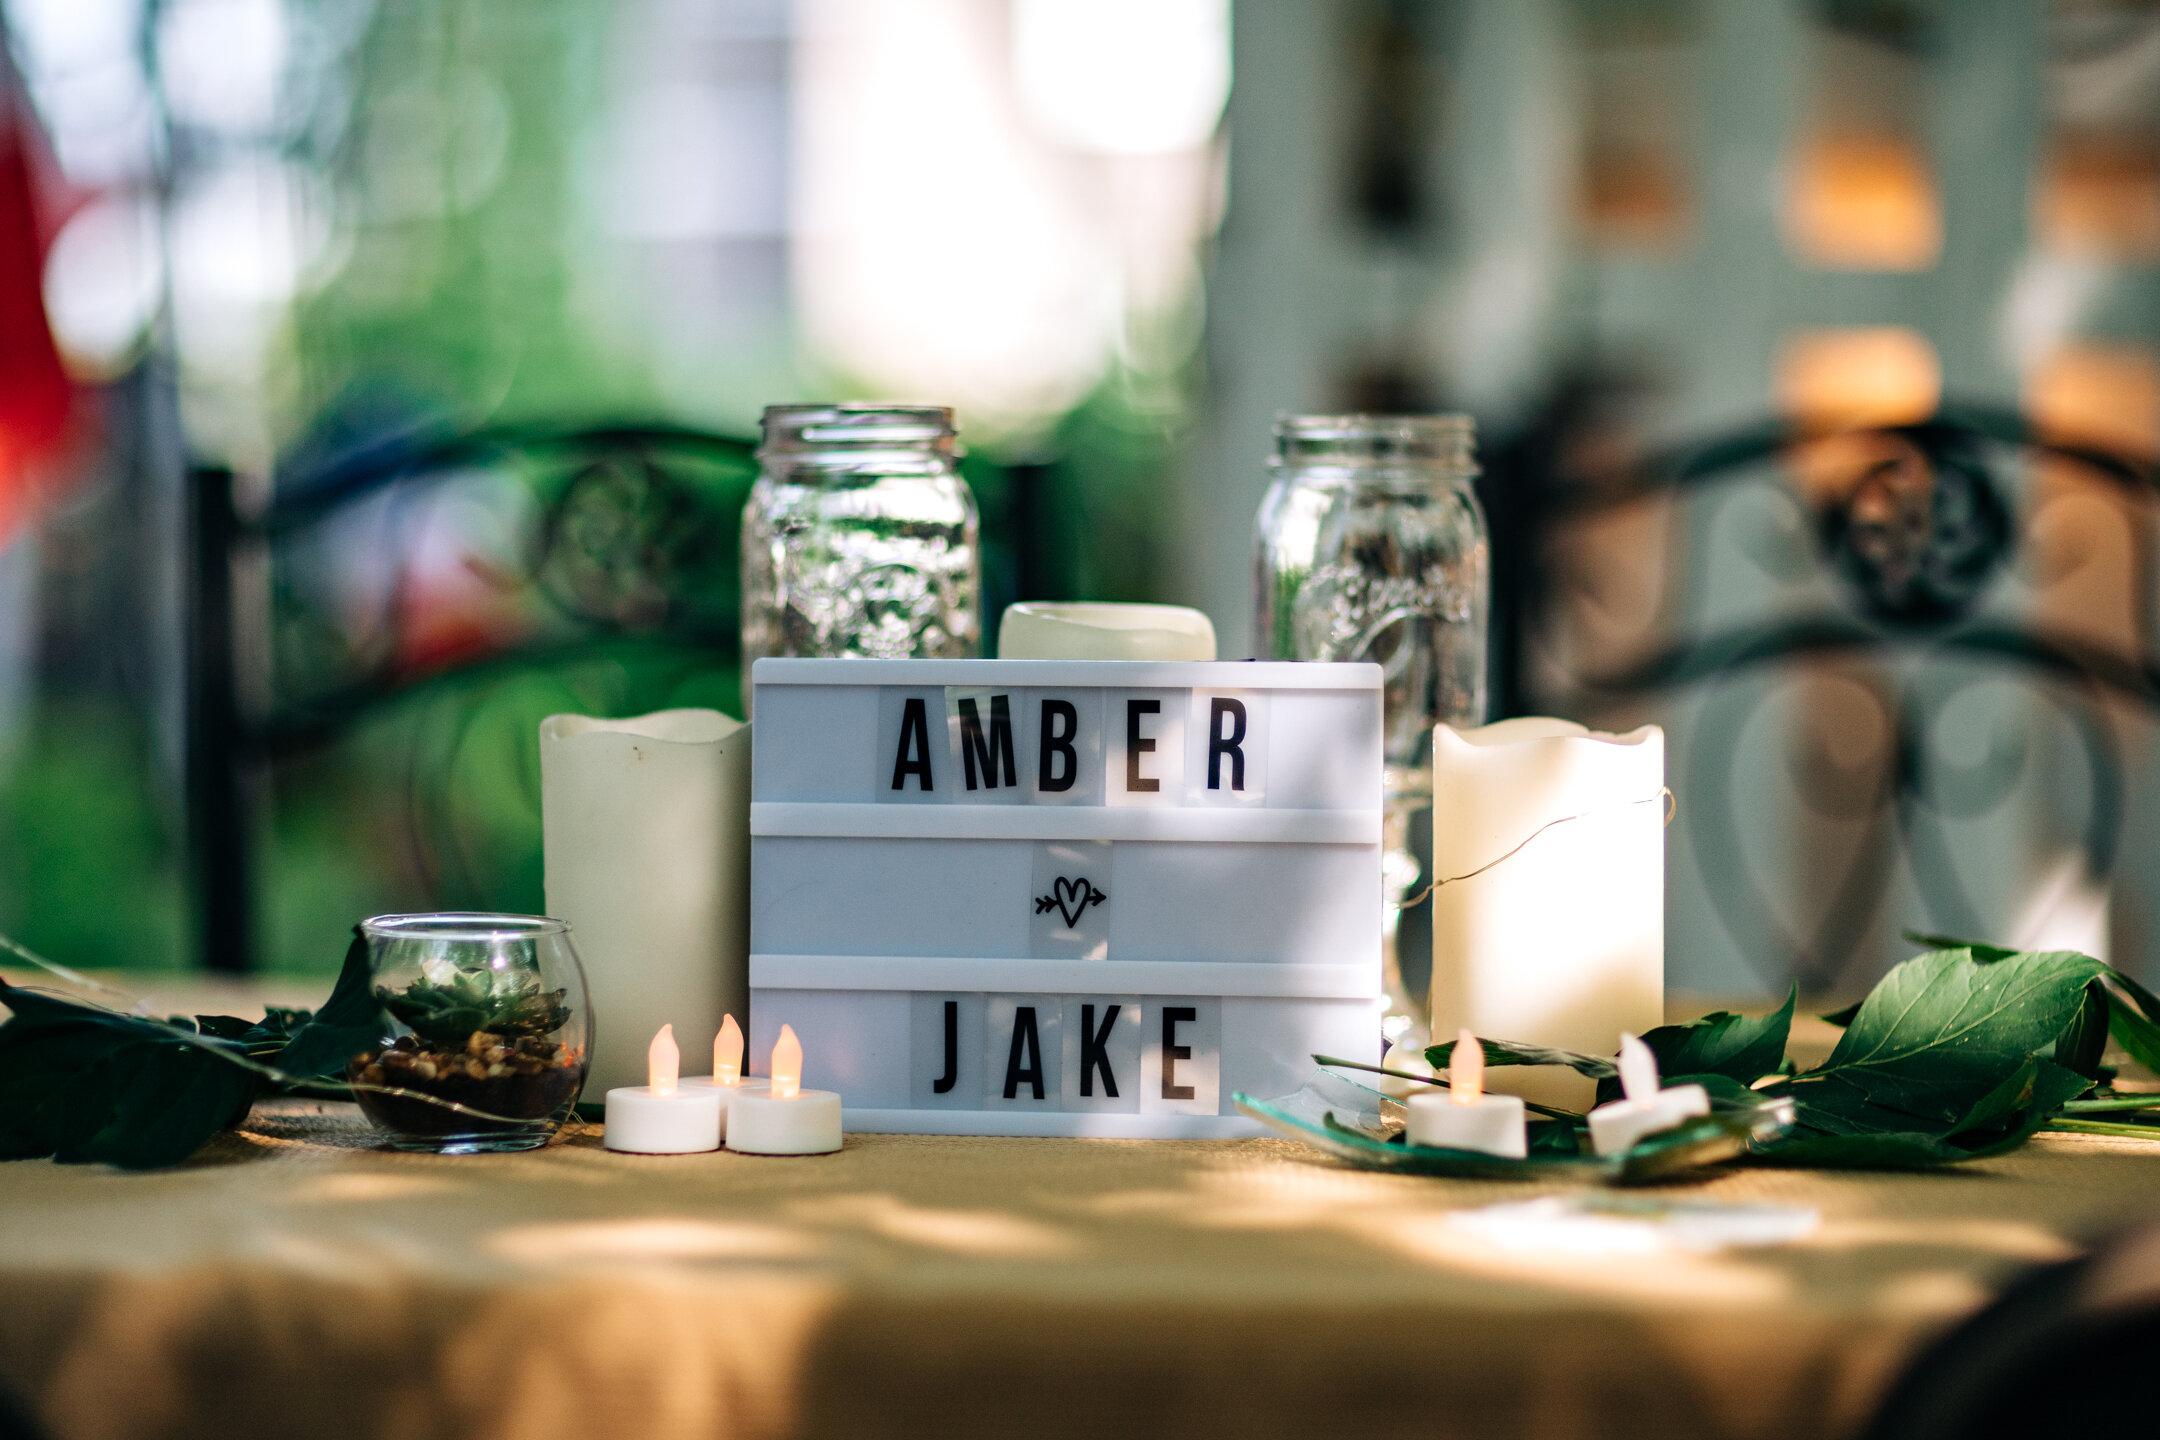 Jake-Amber-Wedding-06386.jpg